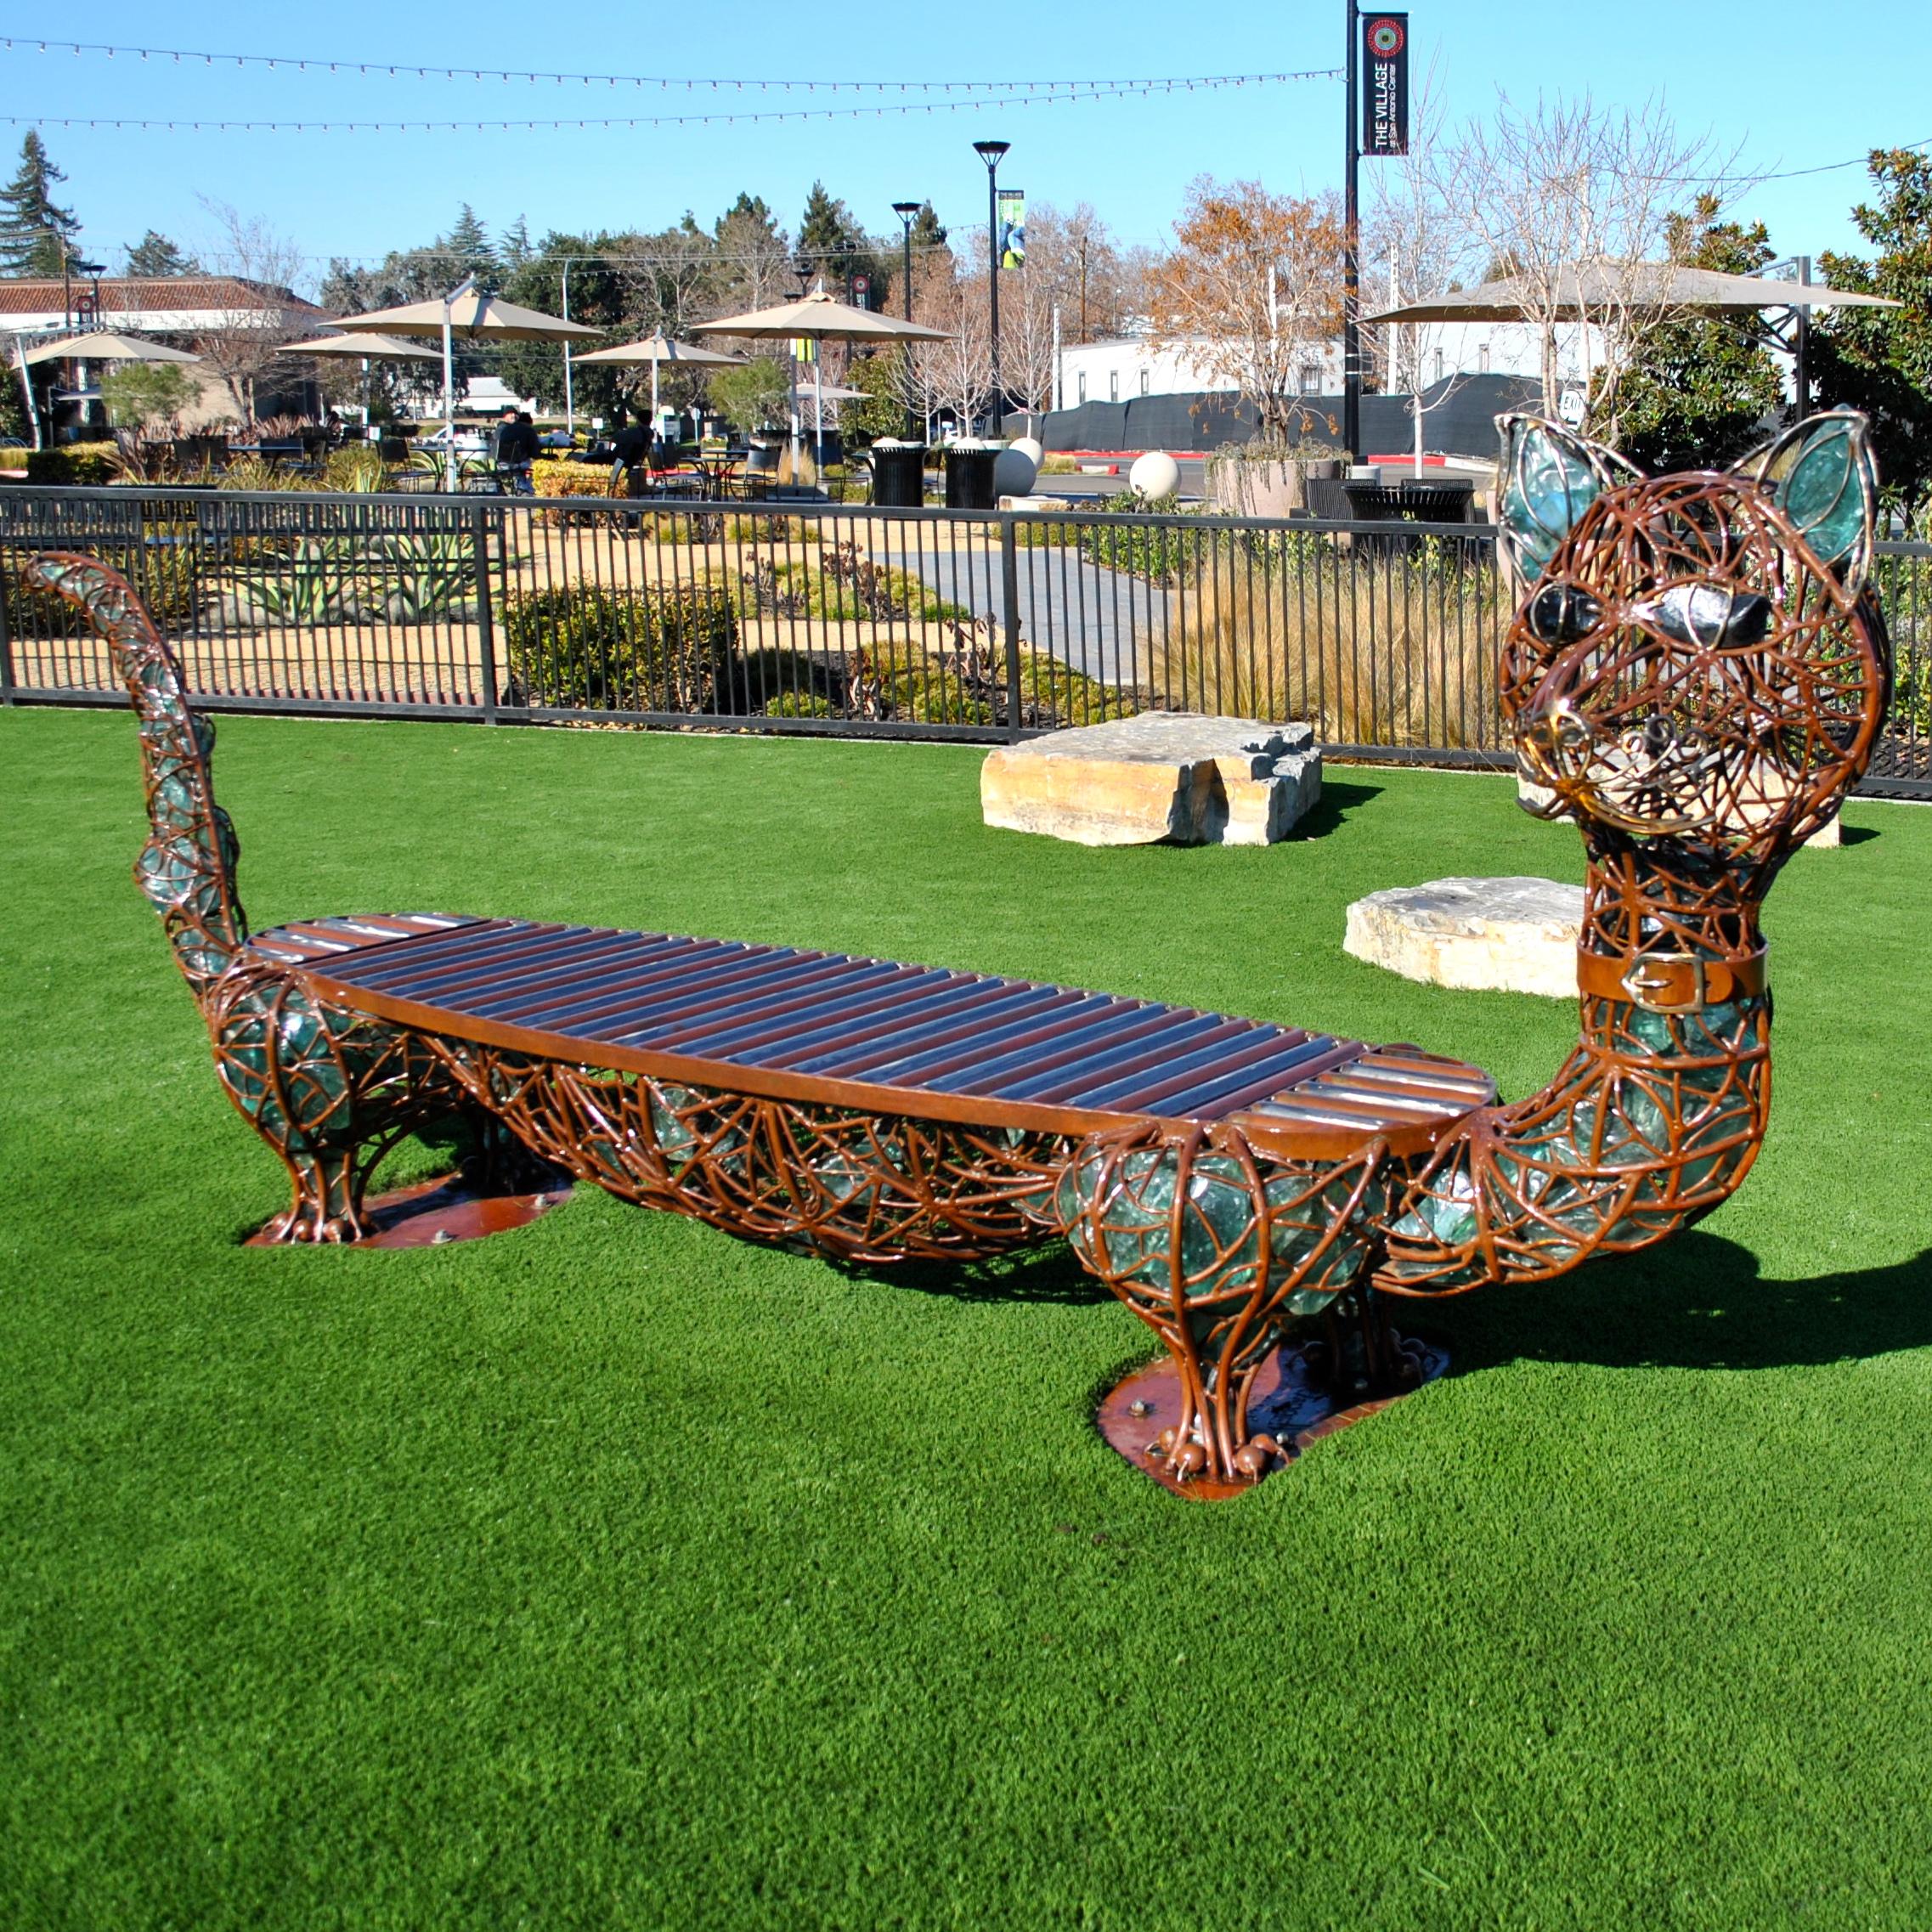 Dog Day Care Palo Alto